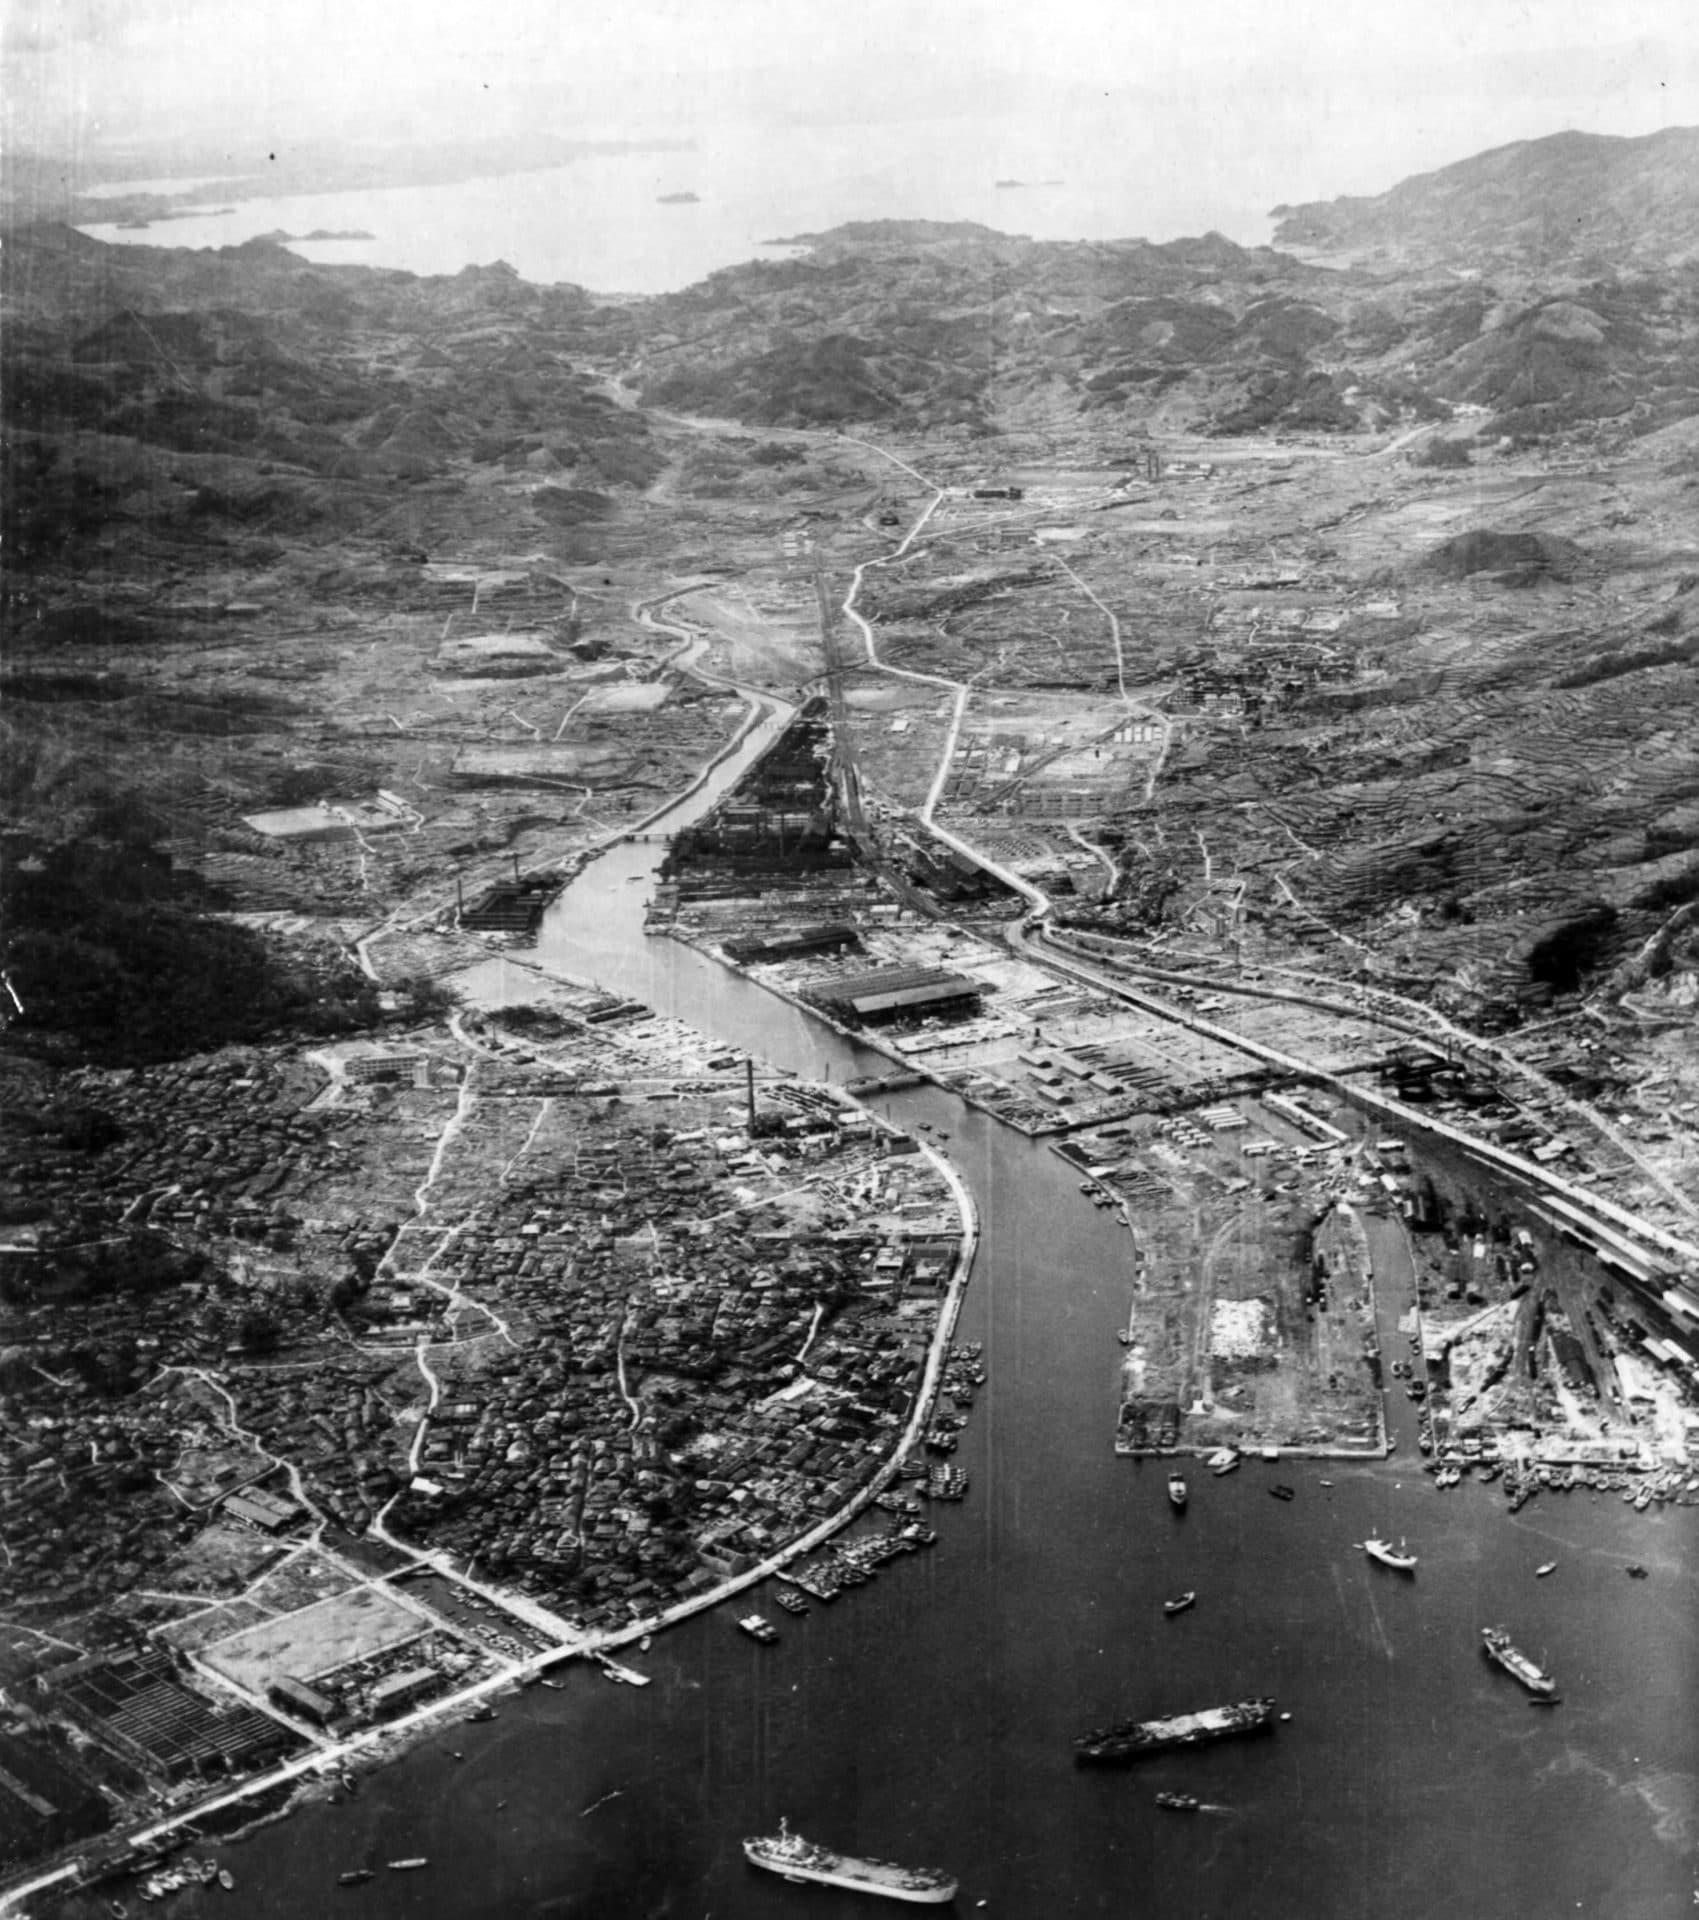 urakami valley nagasaki after atomic bomb 1945